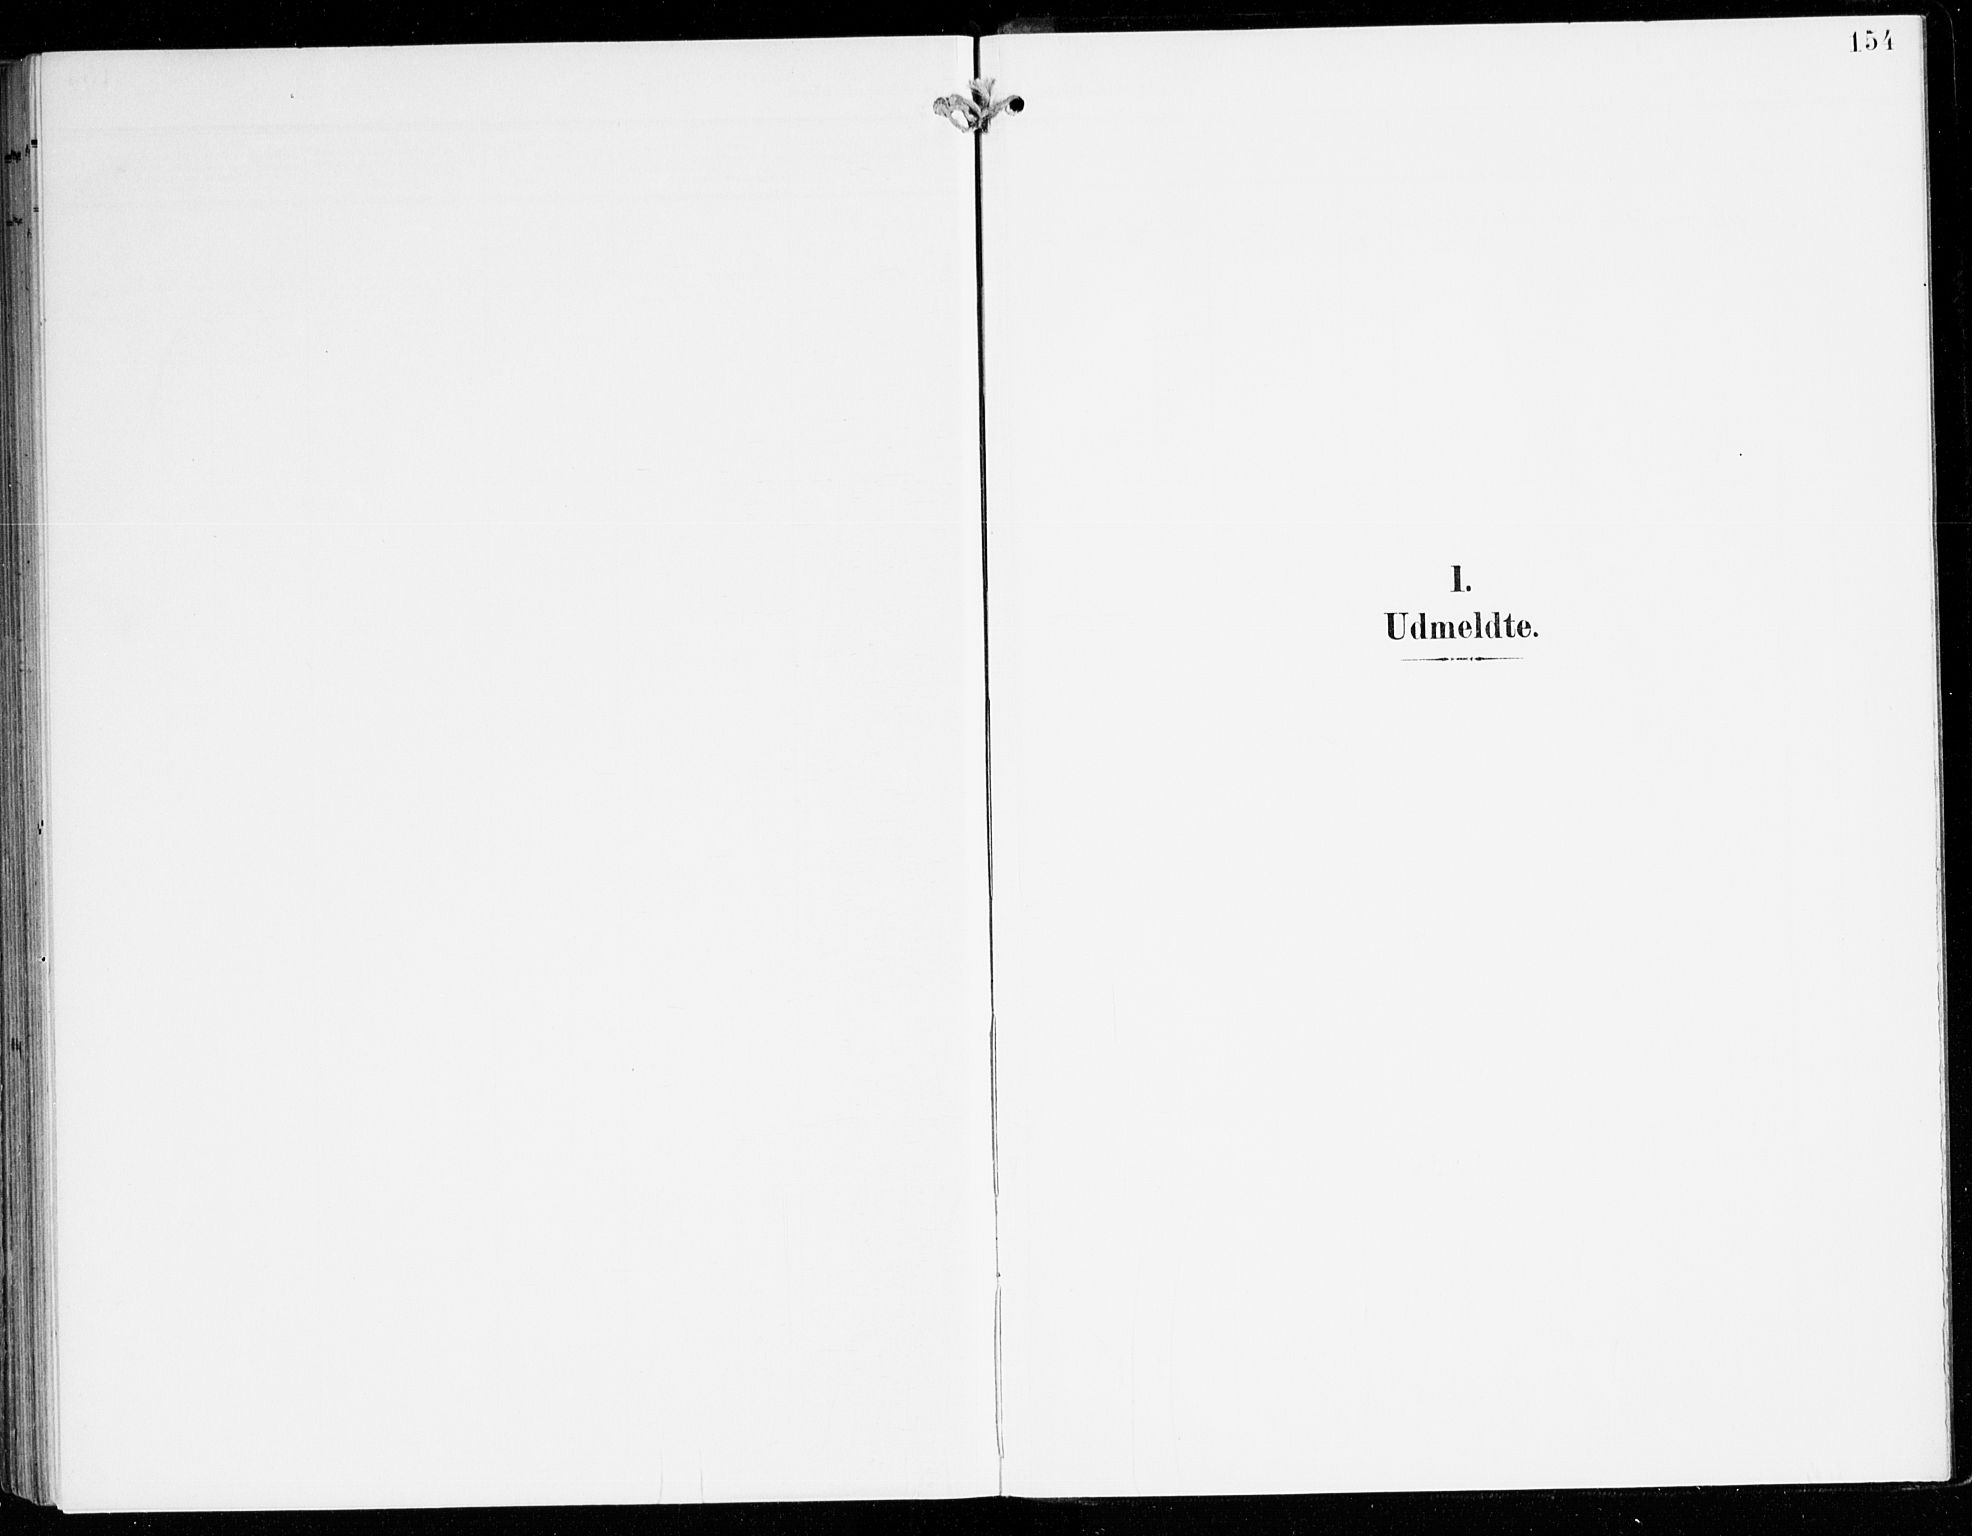 SAB, Hyllestad Sokneprestembete, Ministerialbok nr. D 2, 1905-1919, s. 154